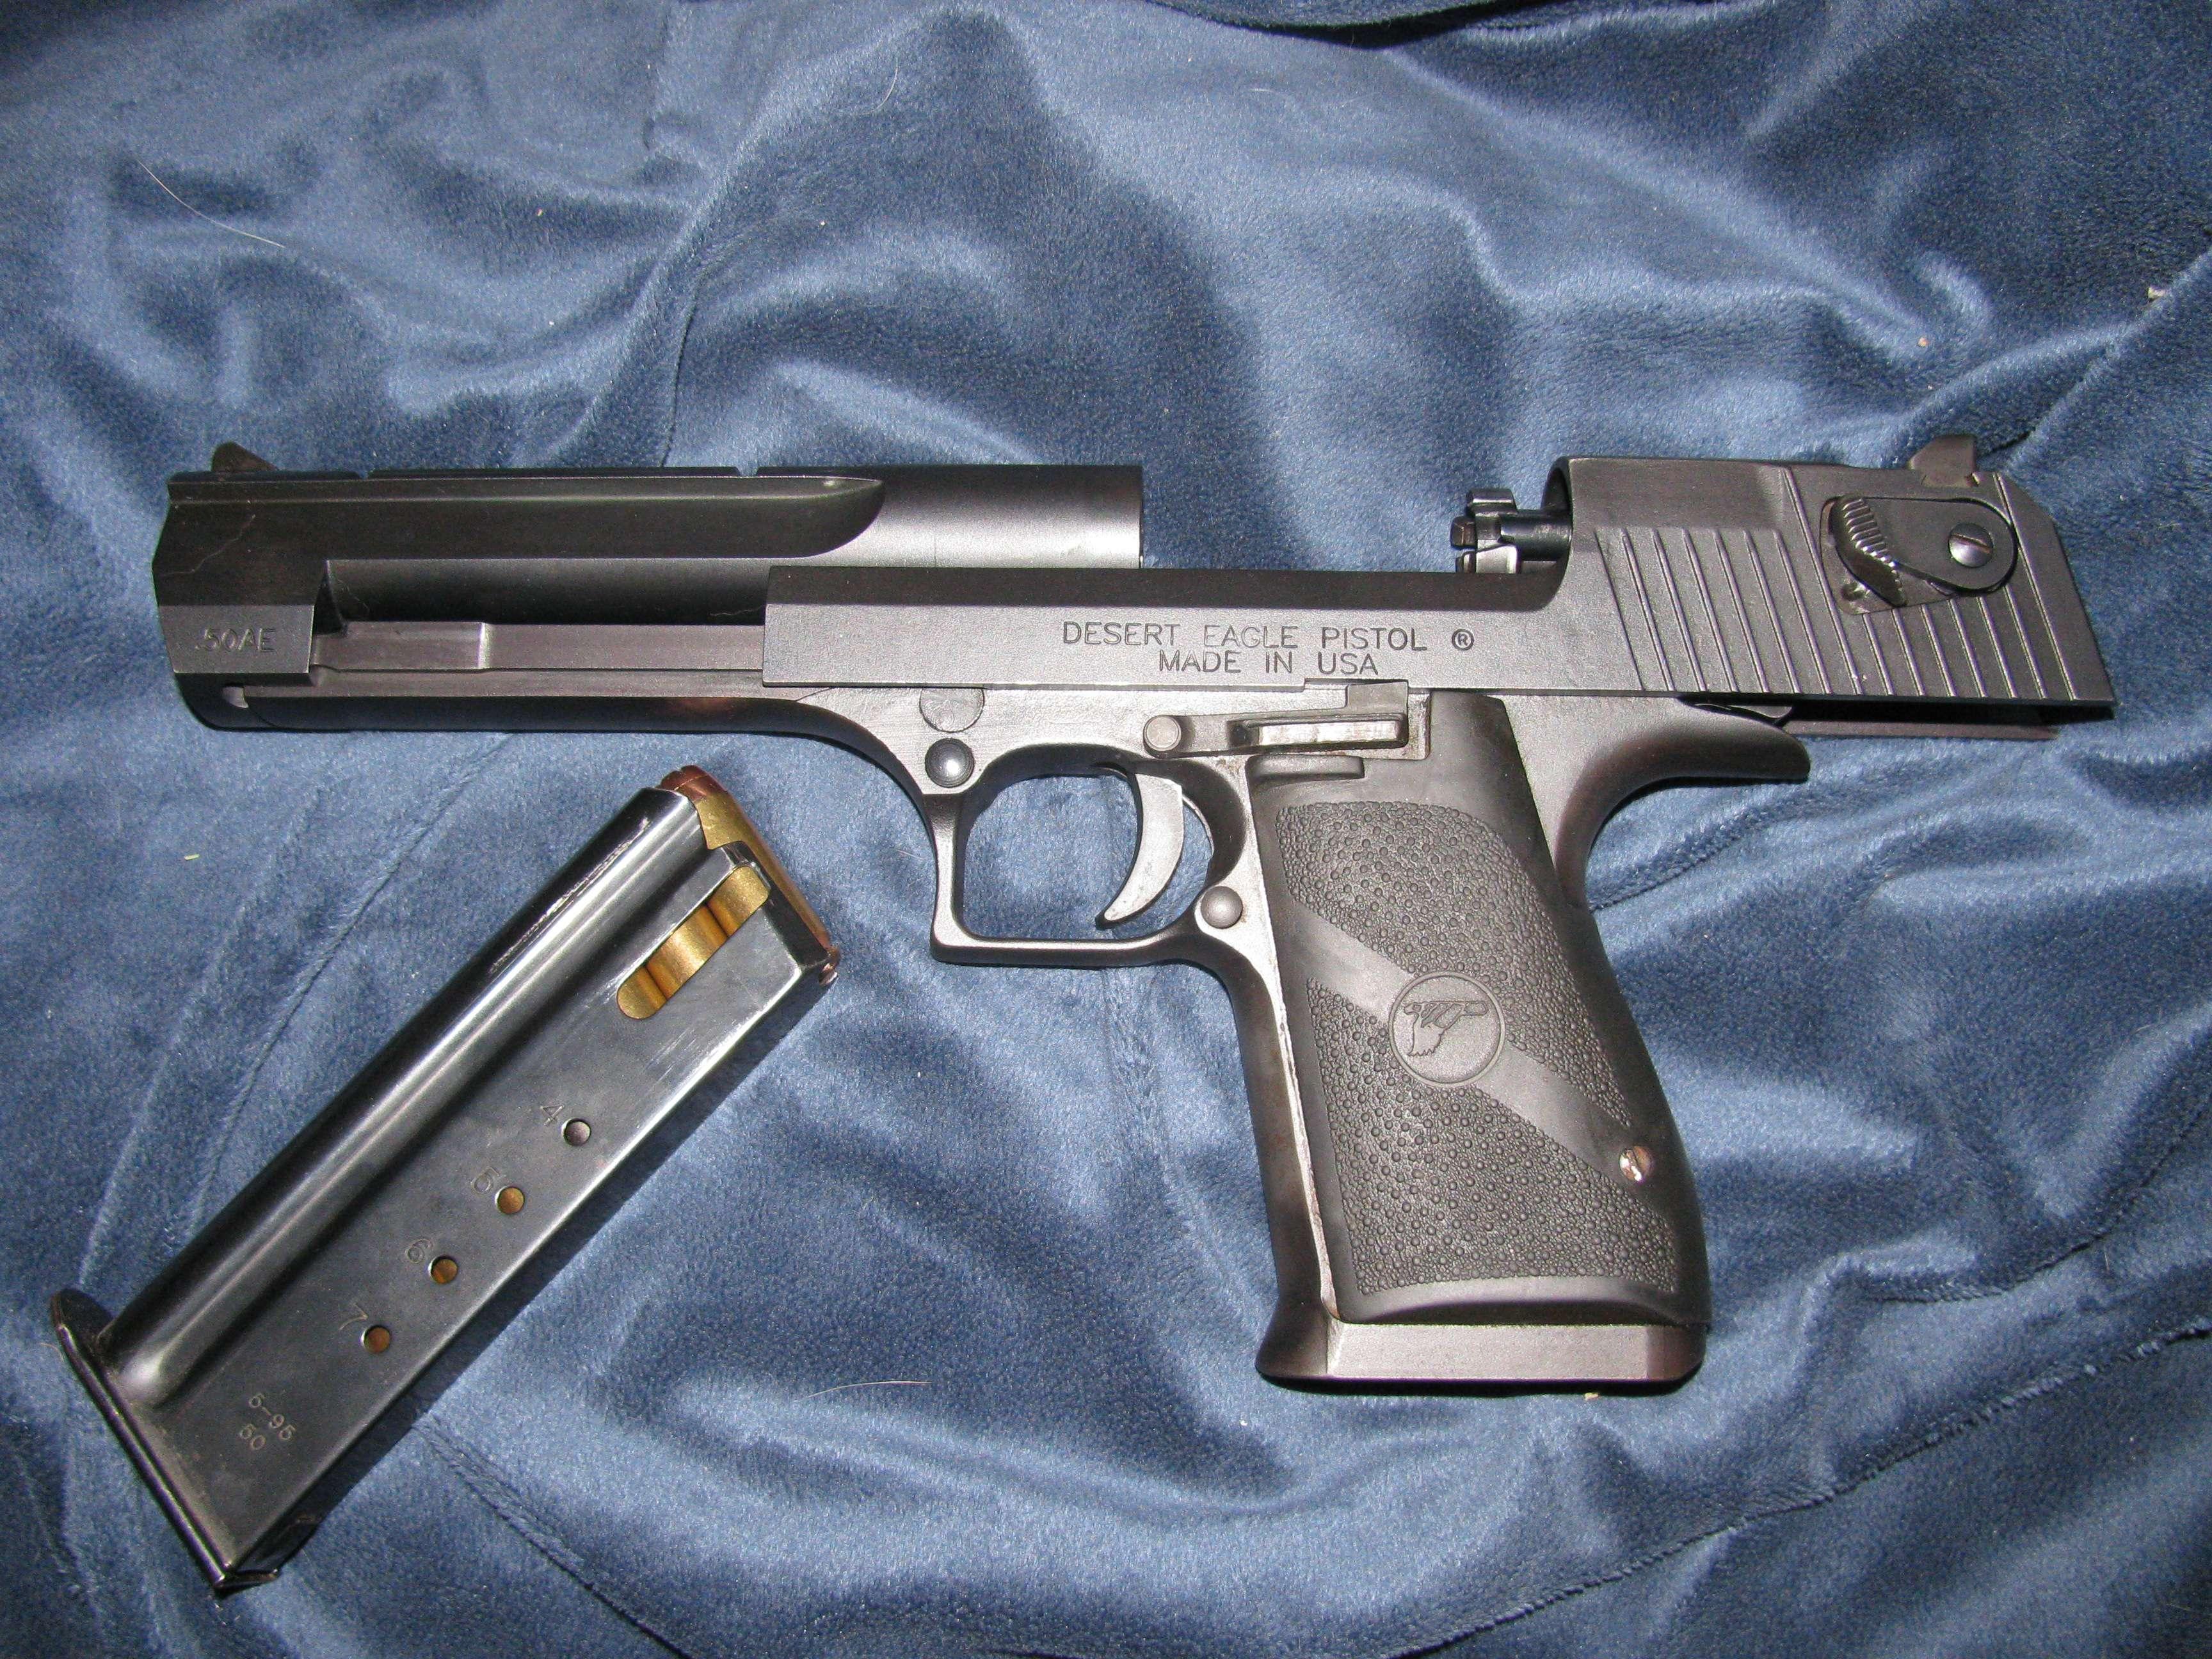 Wife's Desert Eagle - Semi-Auto Handguns